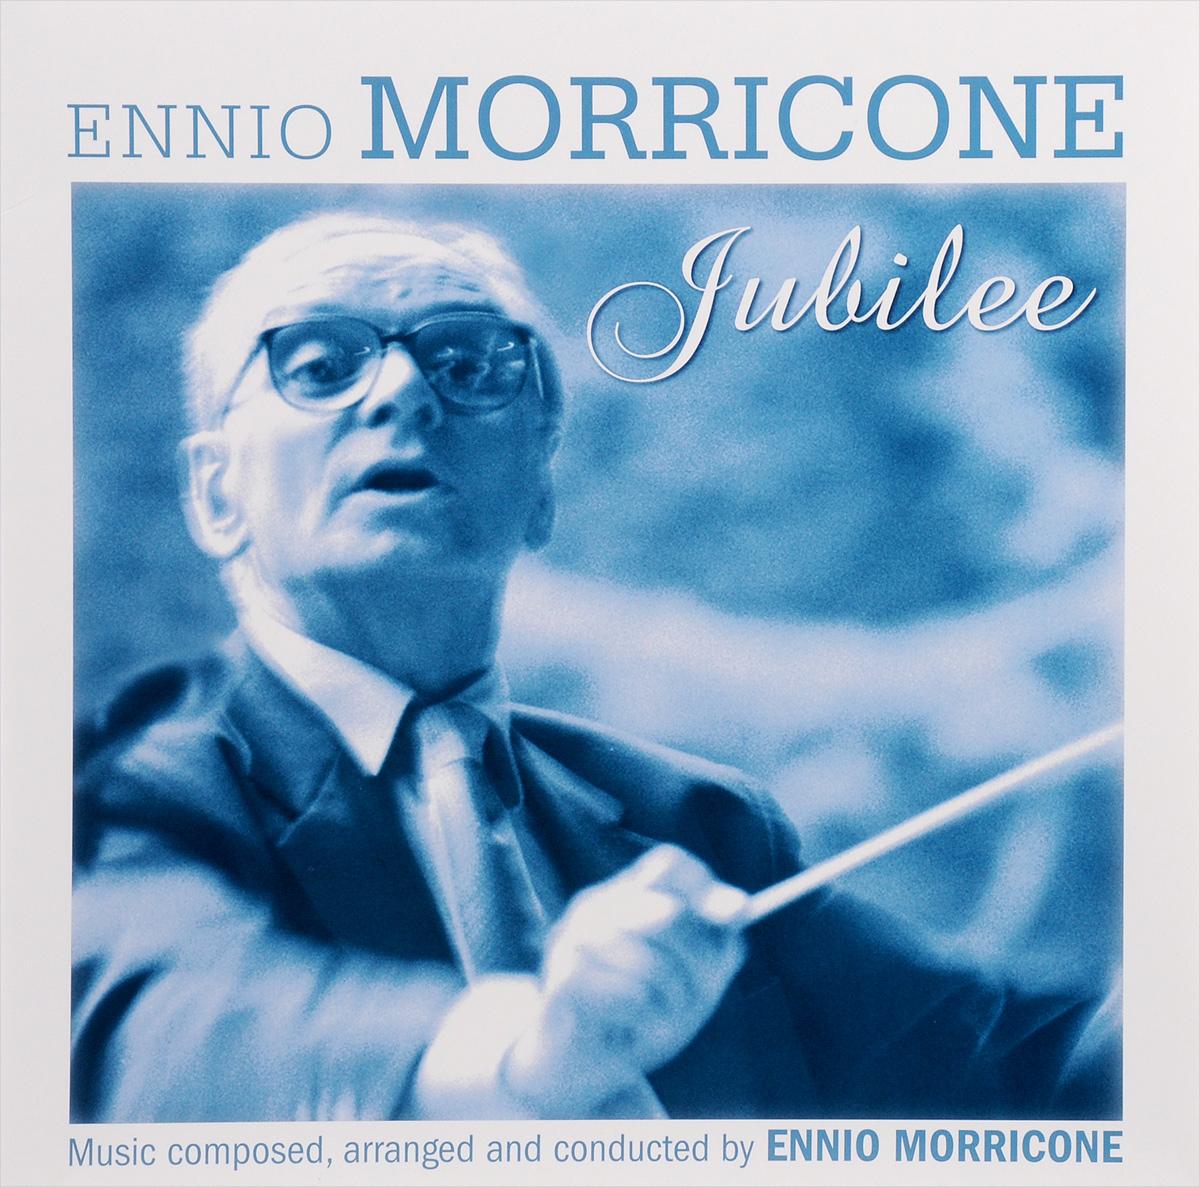 Эннио Морриконе Ennio Morricone. Jubilee (LP) саундтрек саундтрекennio morricone jubilee